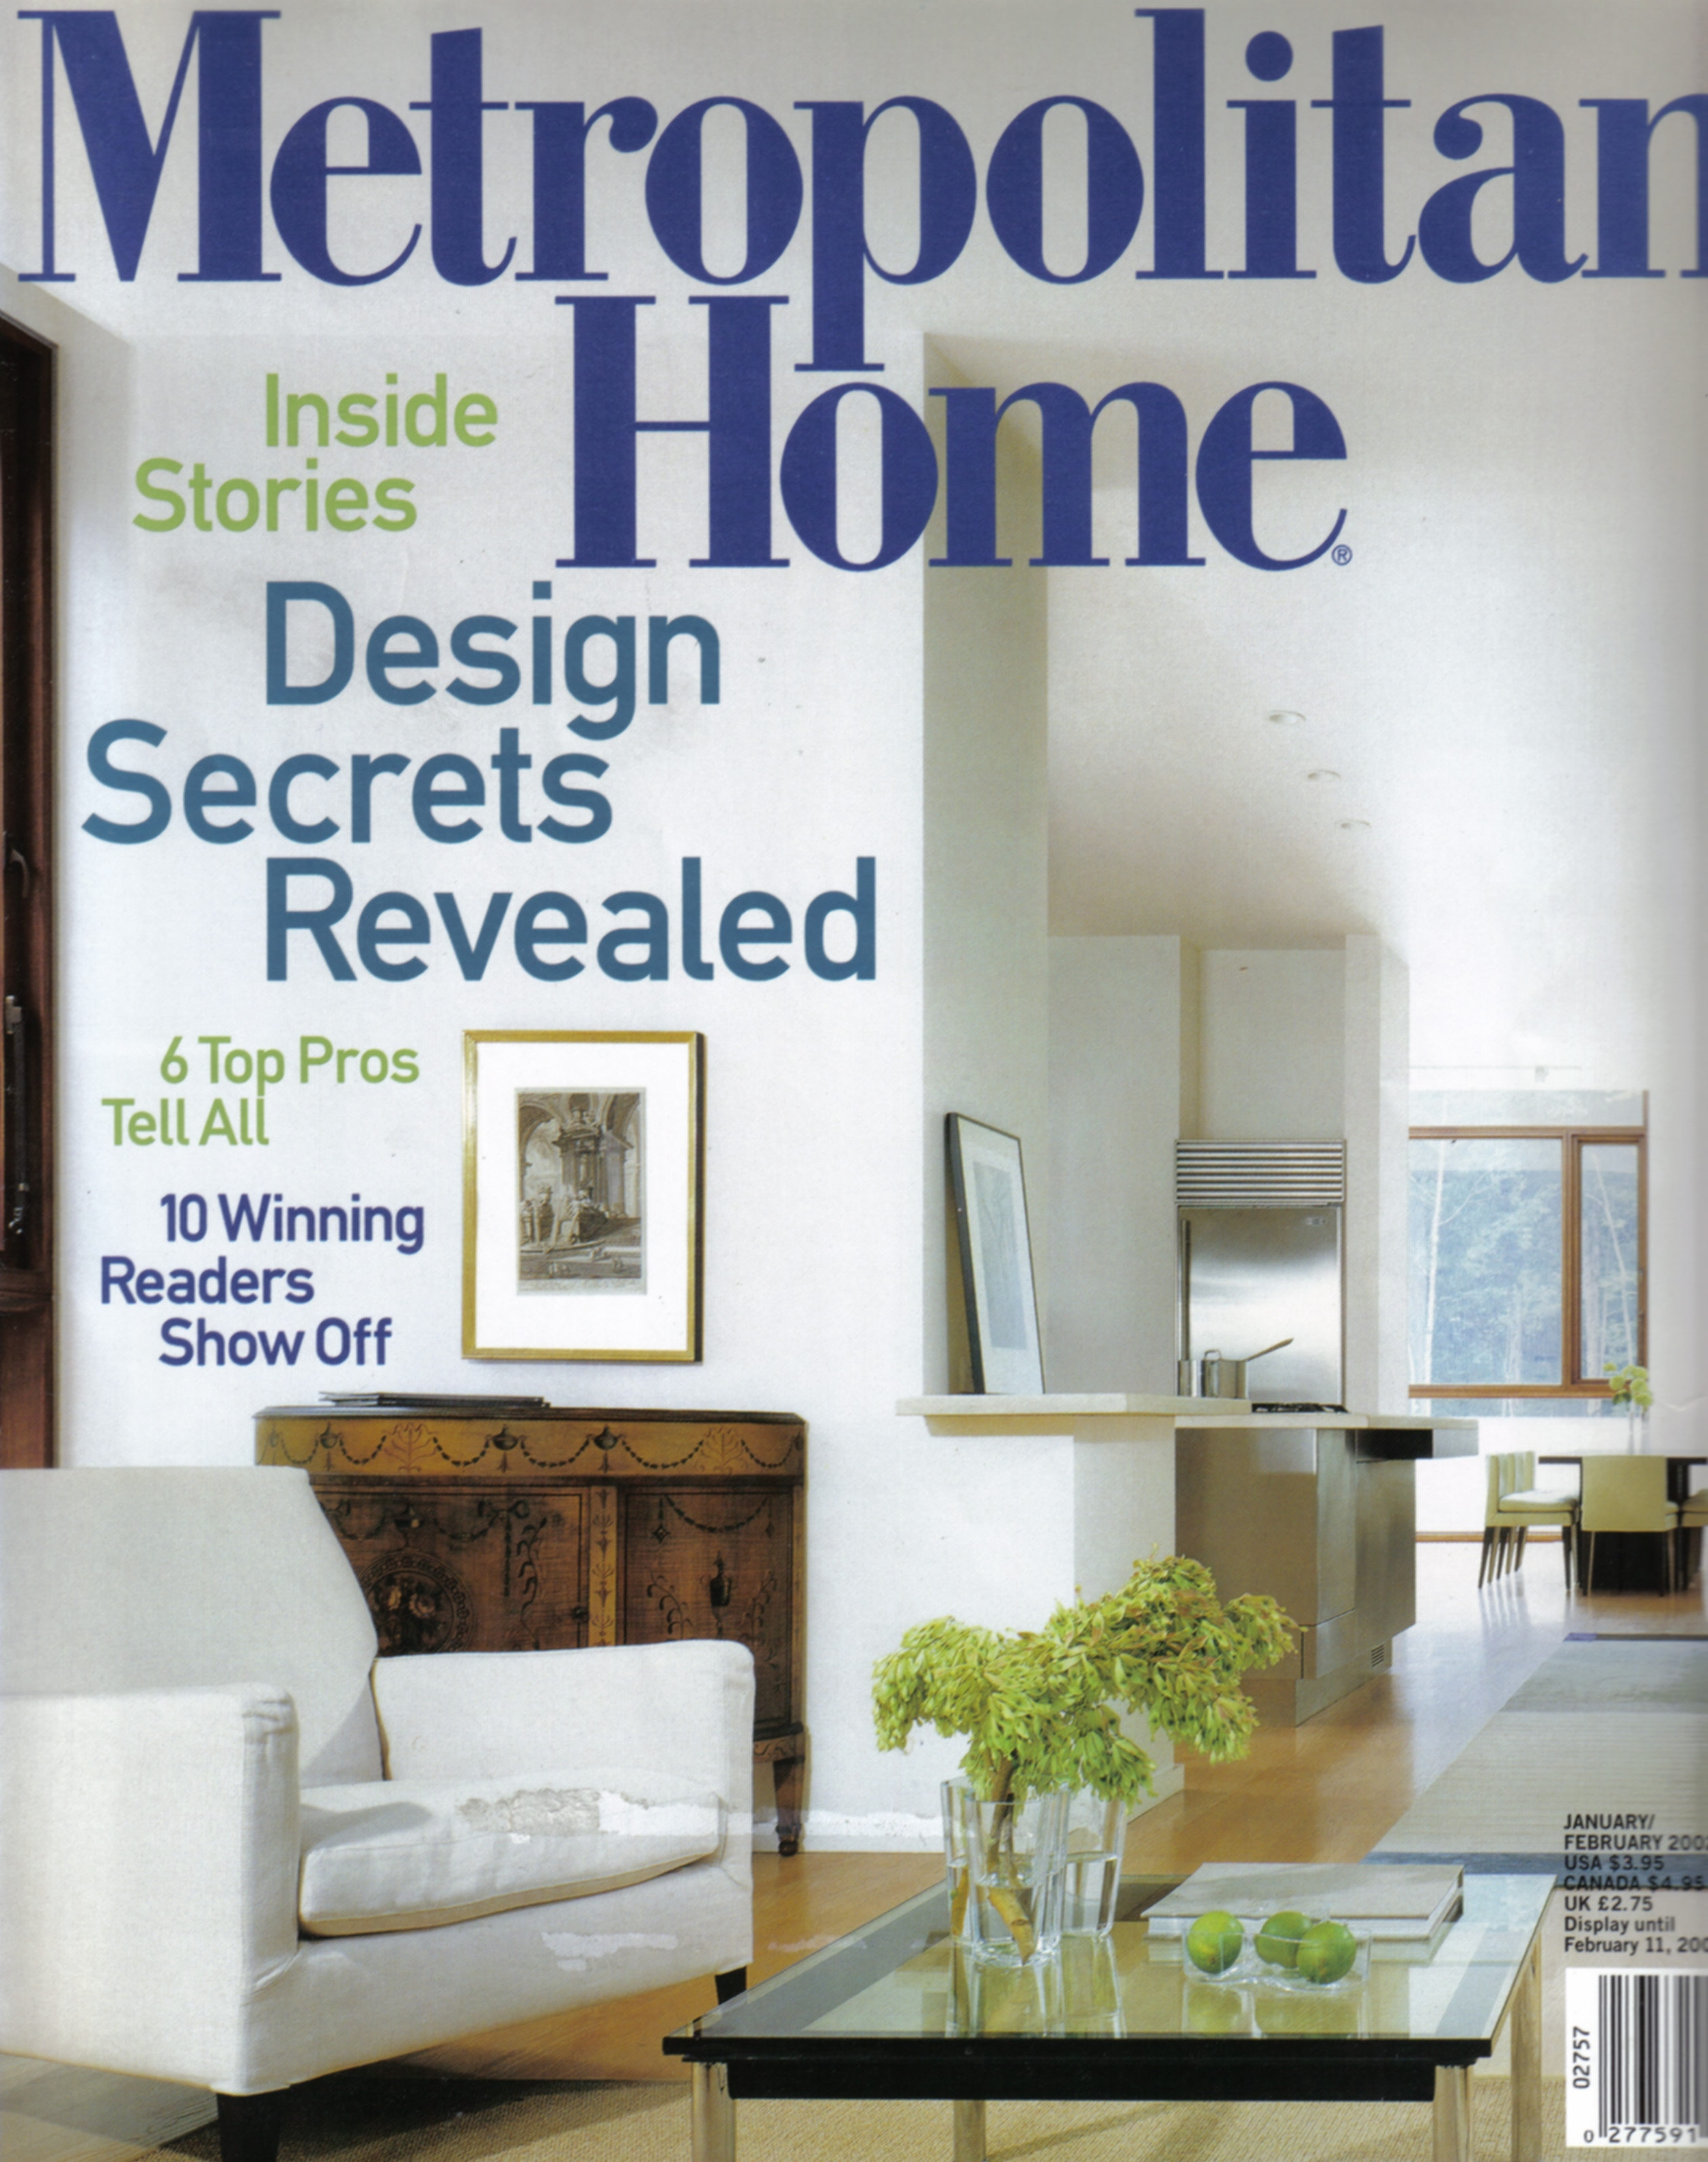 Metropolitan_Home_cover_jan_2002.jpg